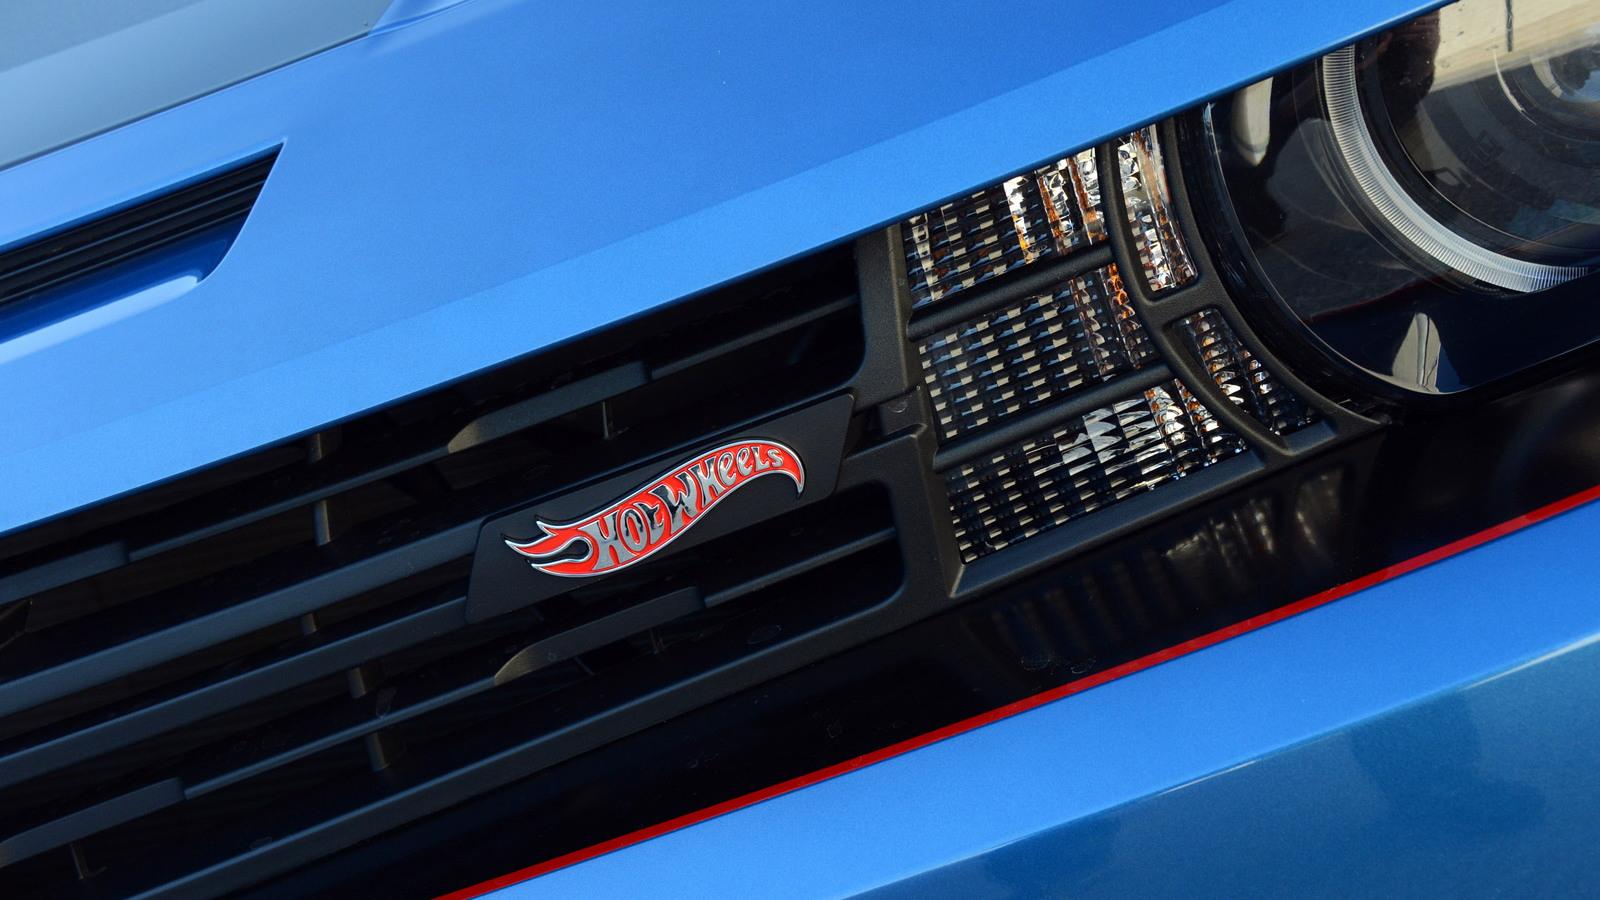 2013 Chevrolet Camaro Hot Wheels Edition Convertible